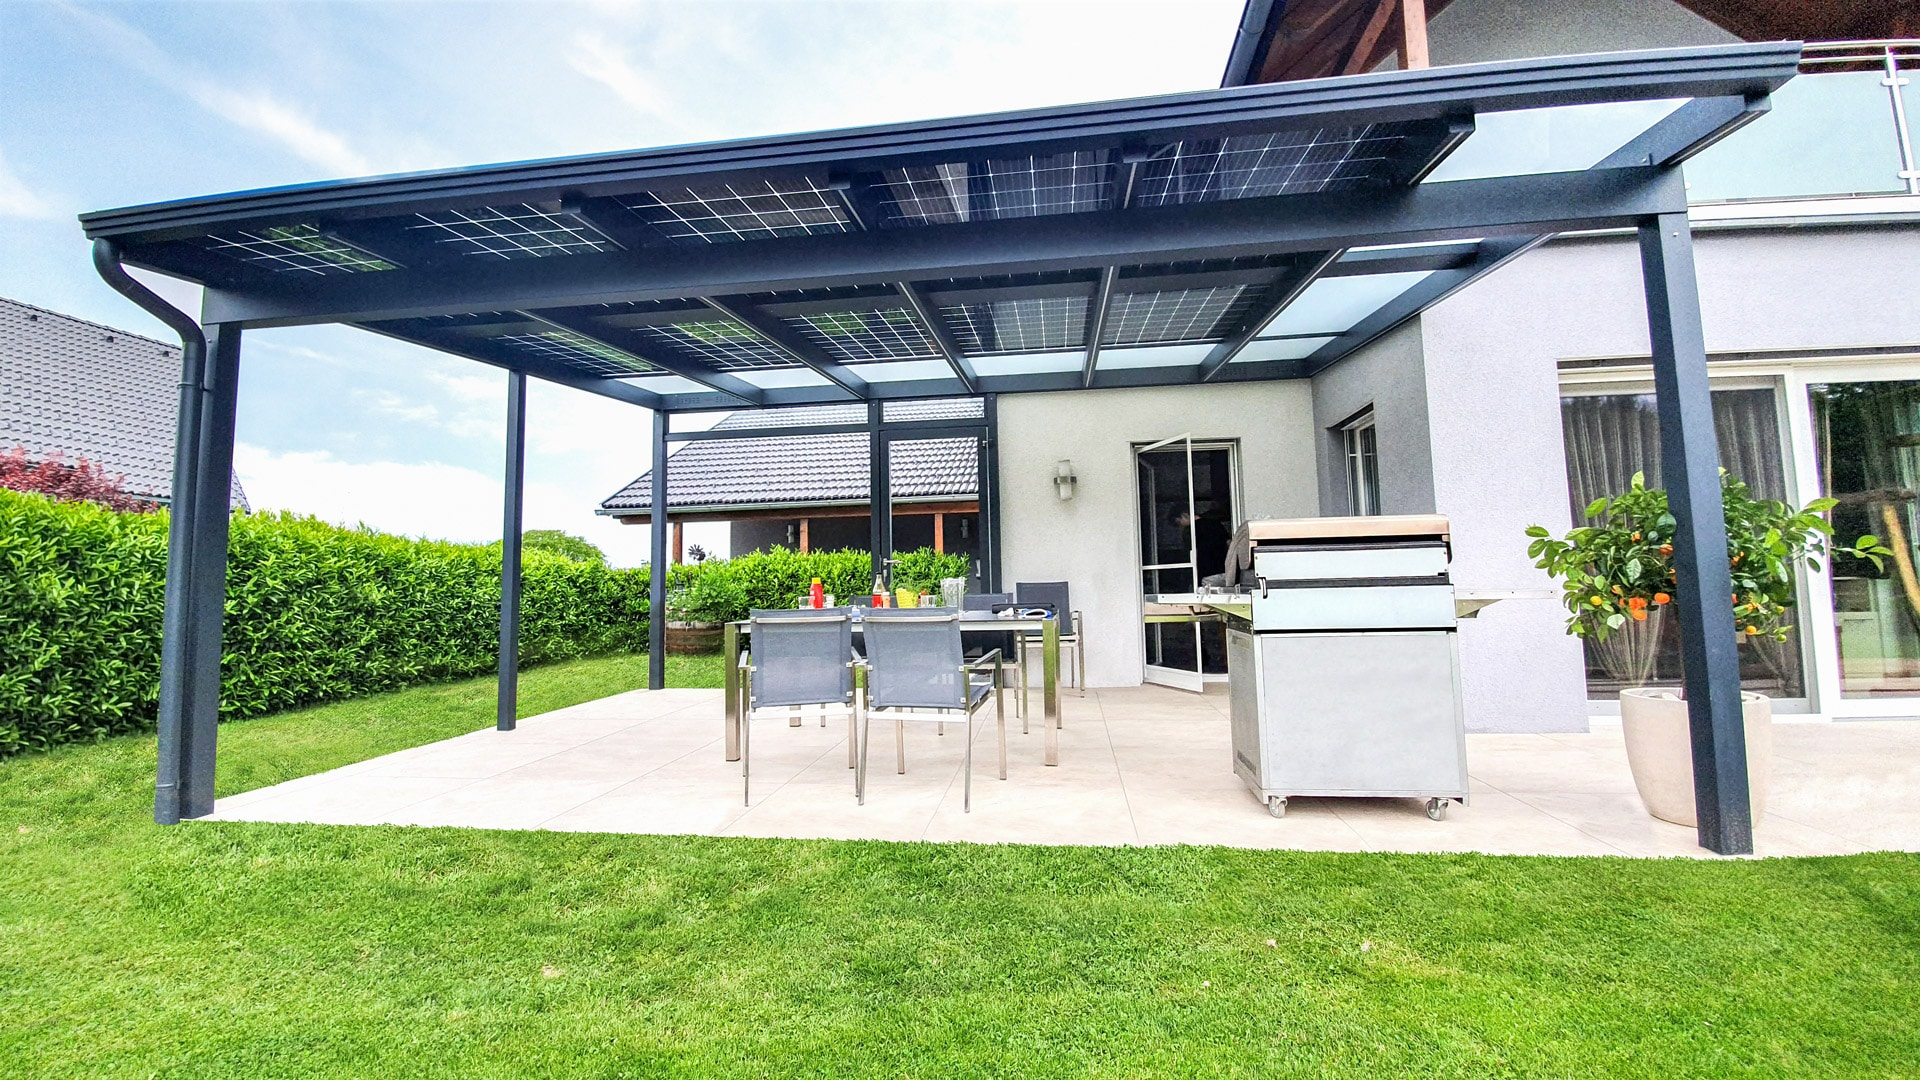 Photovoltaikdach 04 a   Photovoltaik-Module bei Terrassendach, Beschattung, Stromerzeugung   Svoboda